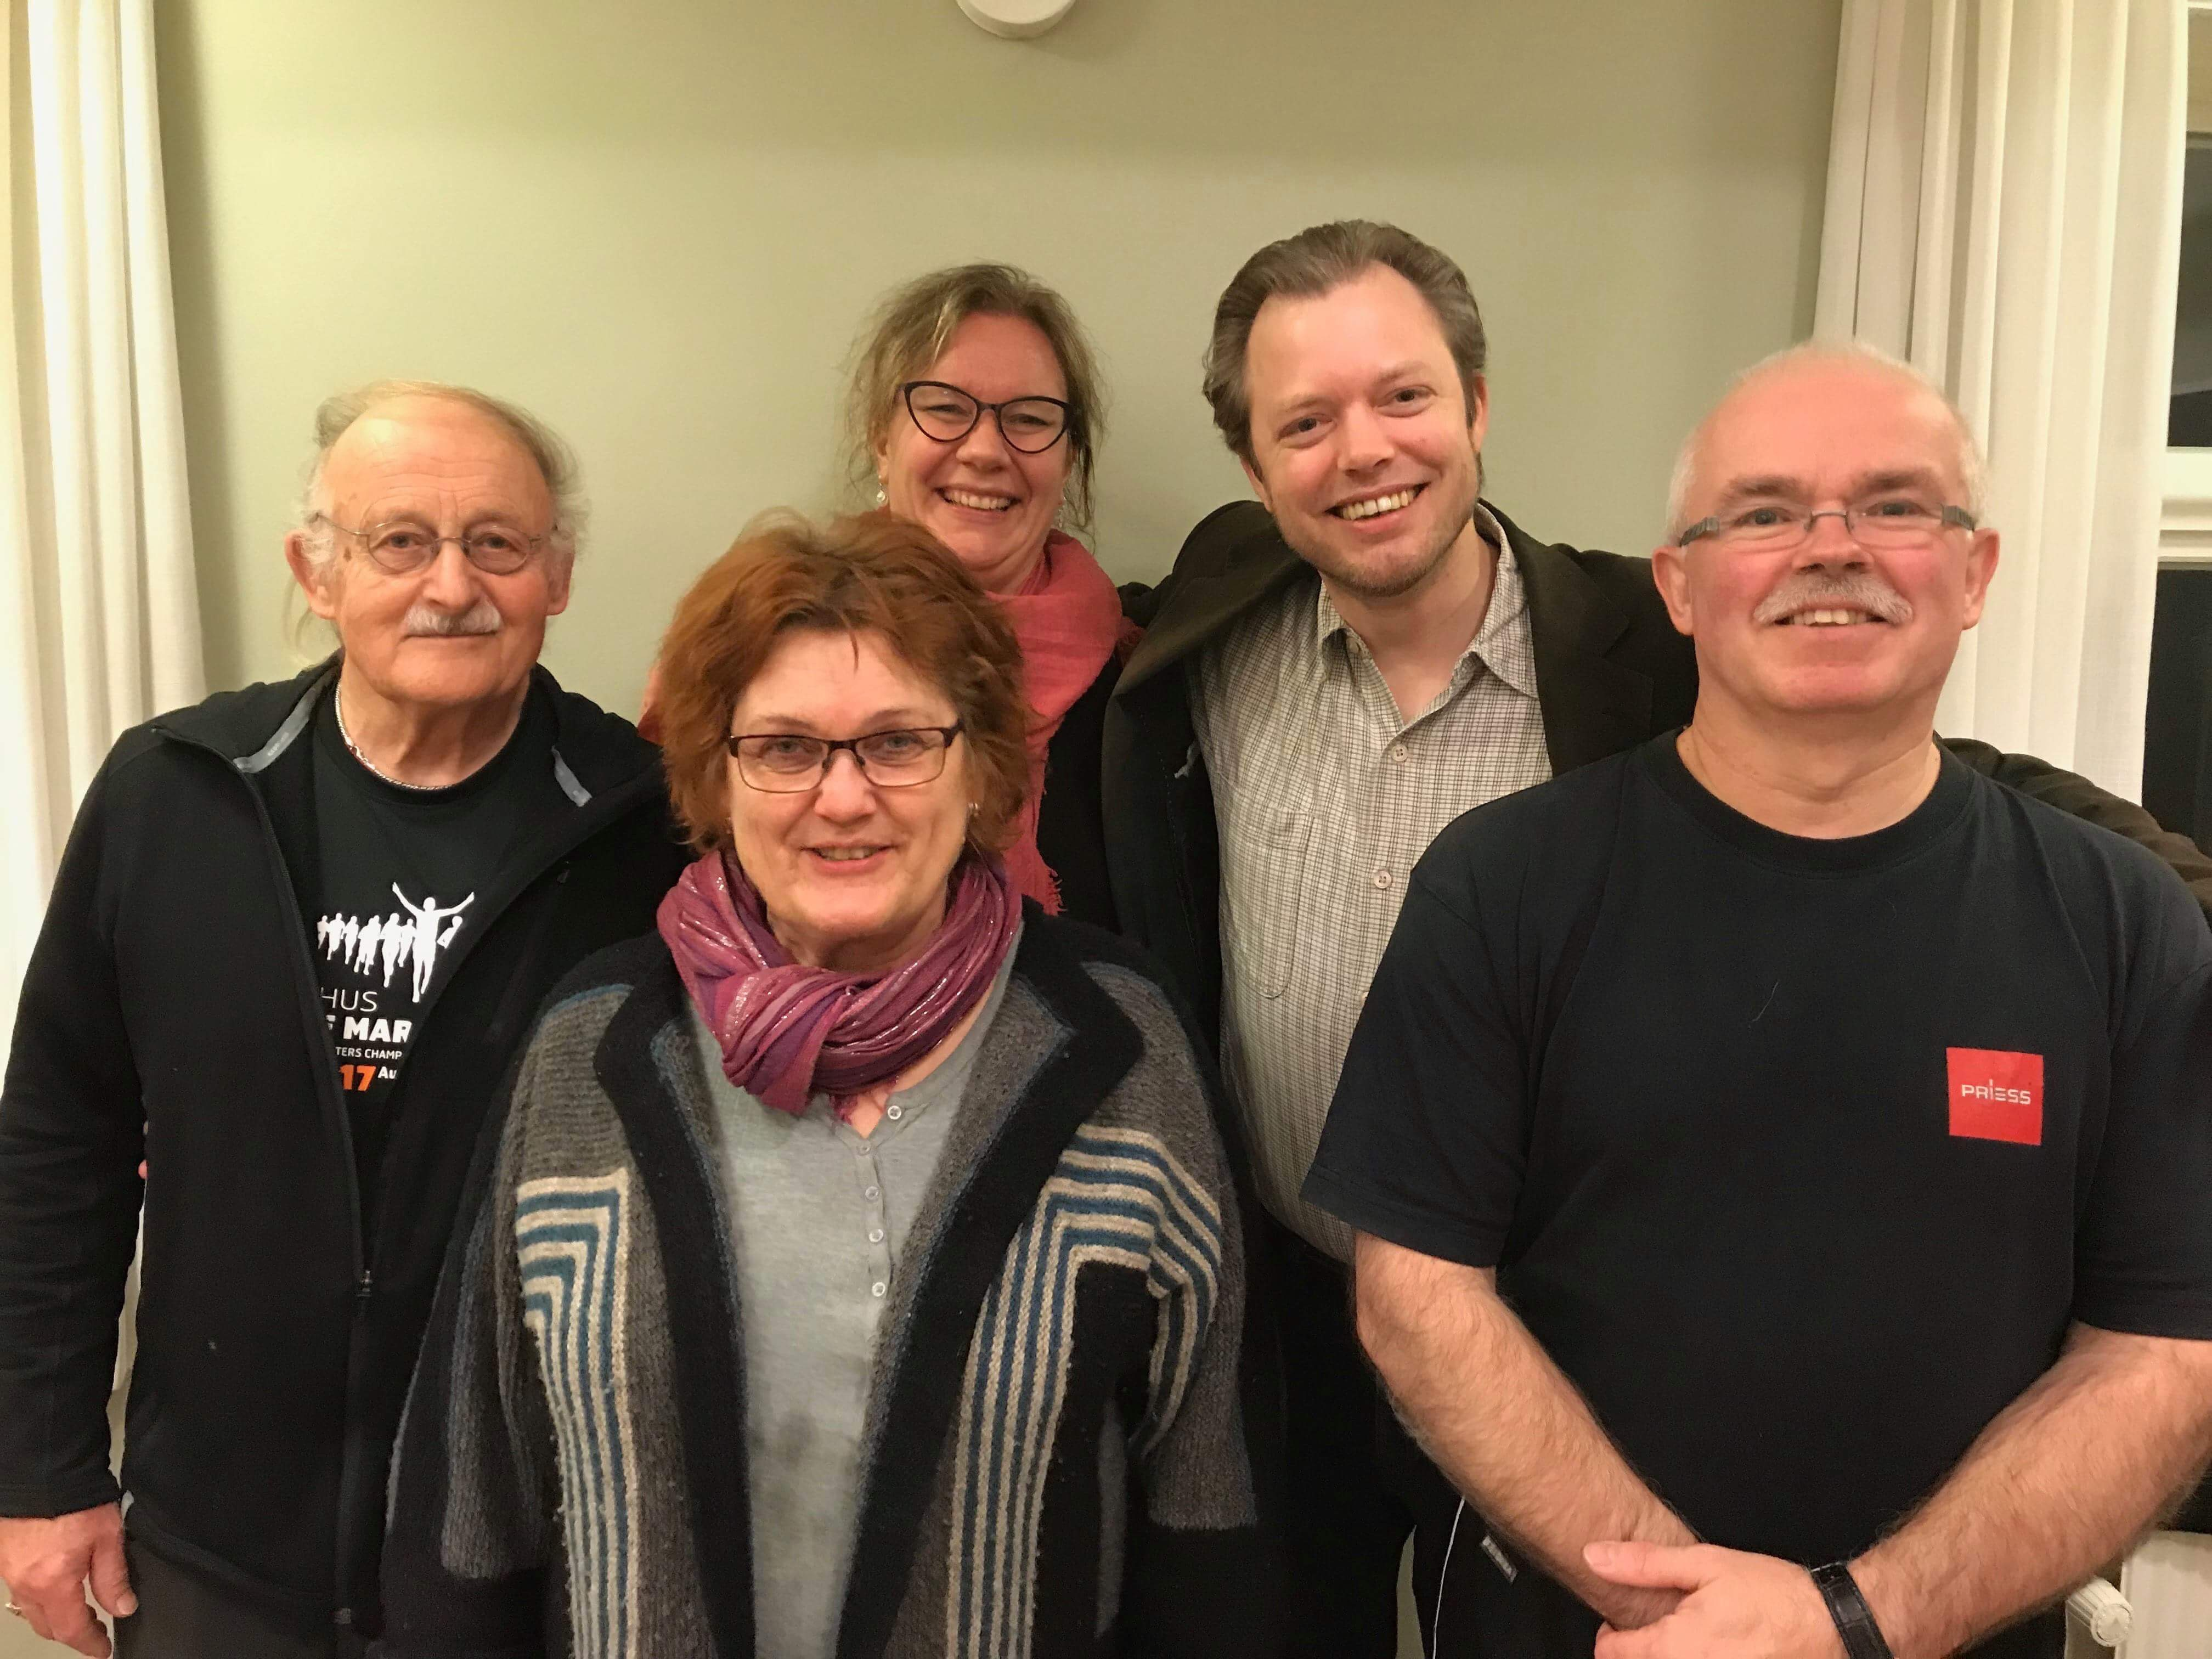 Borgerforeningens bestyrelse. Fra venstre: Holger Quist, Sigrid Tarp, Louise Brusgaard, Chr. Birkebæk, Erik Burmølle Knudsen.